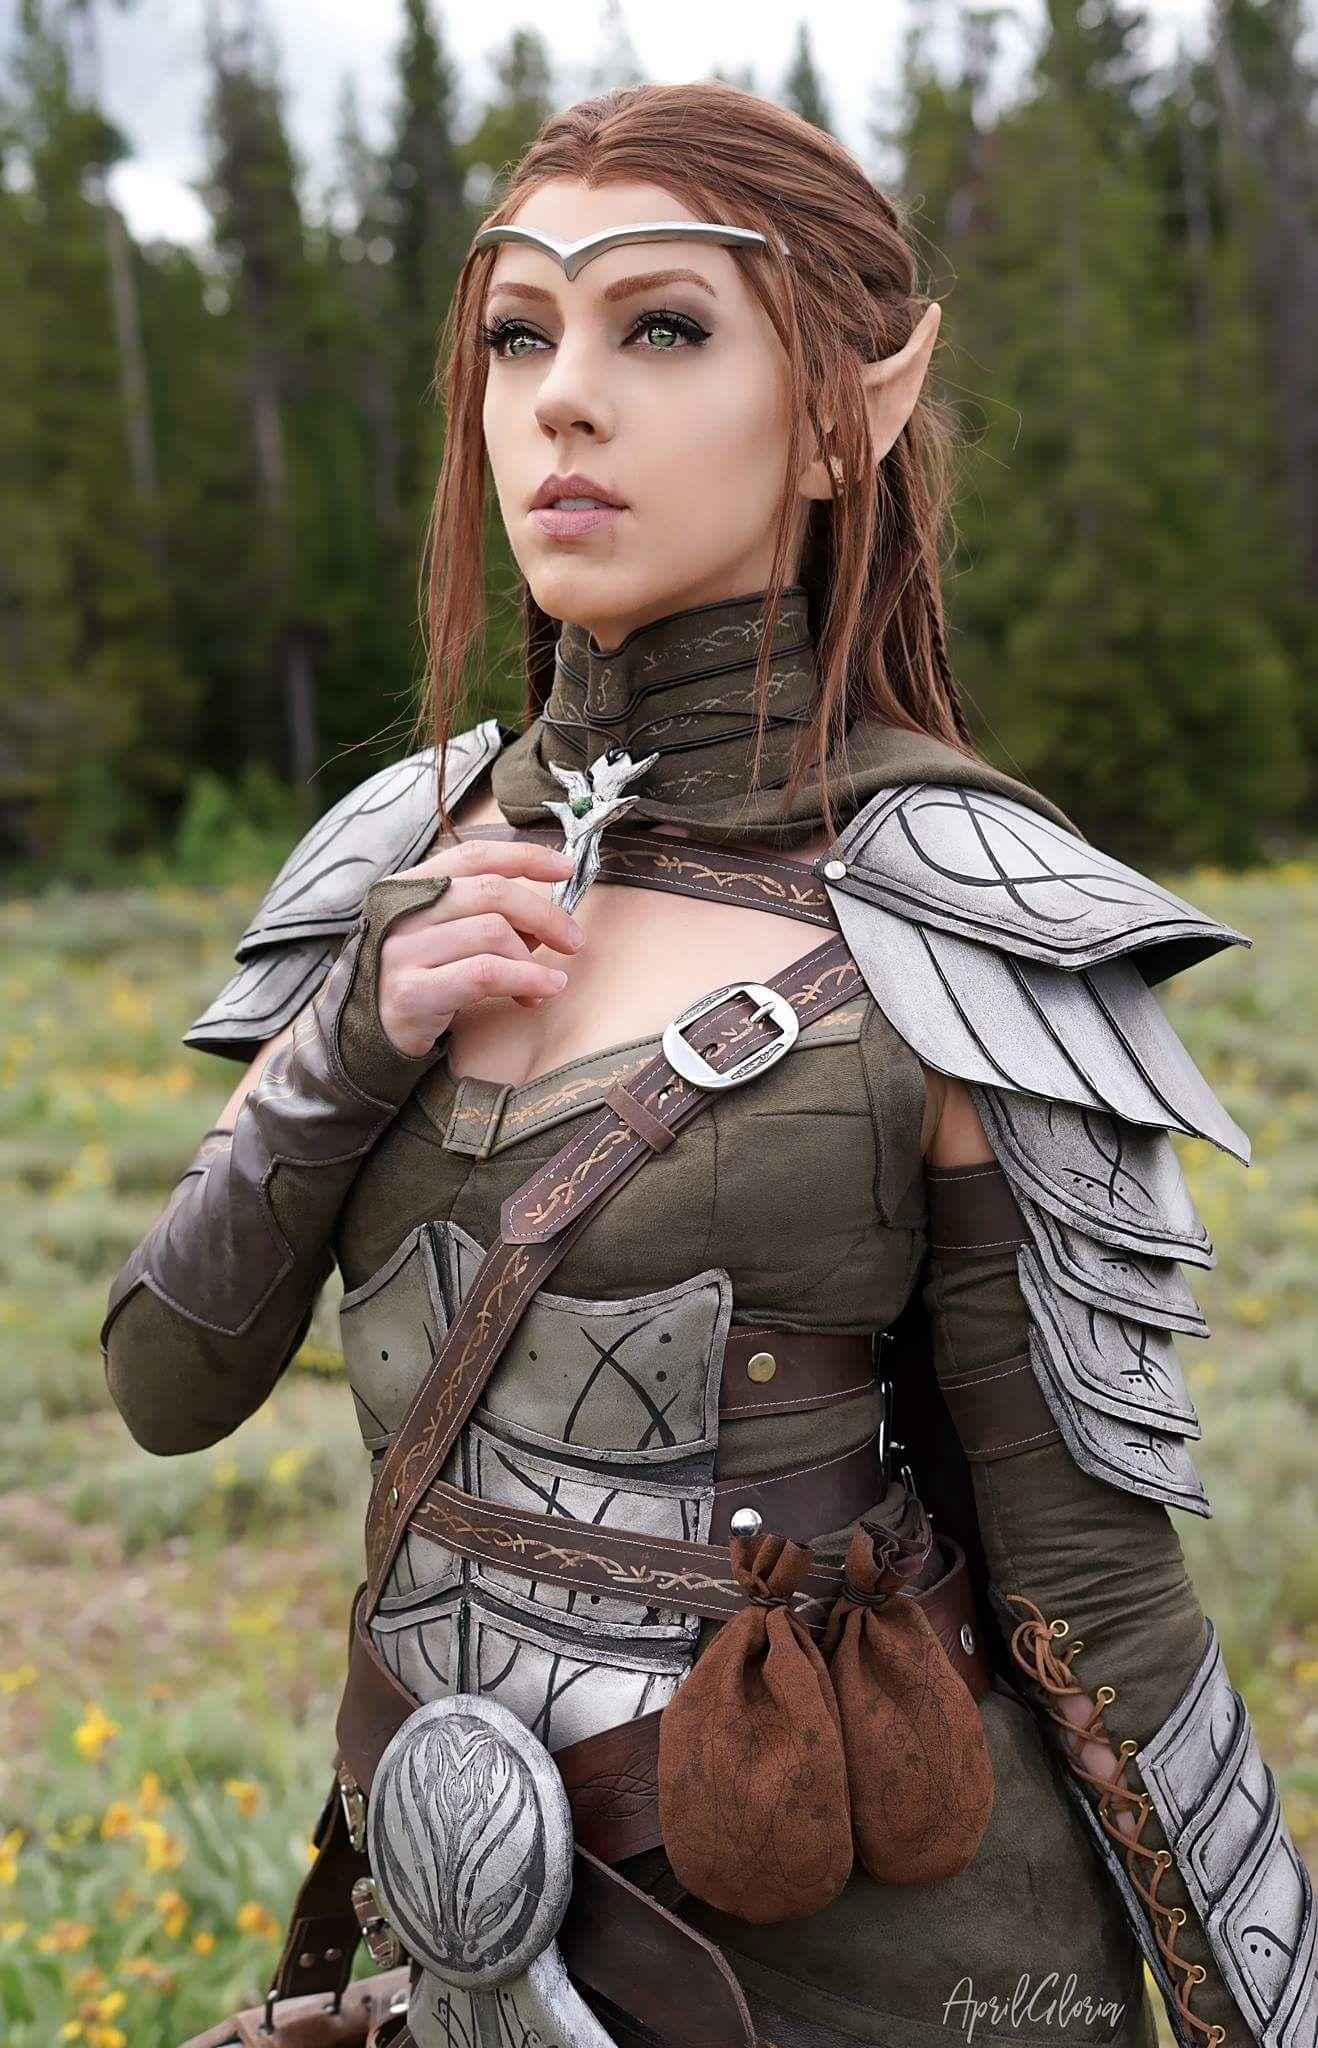 High Elf cosplay from The Elder Scrolls Online cinematic